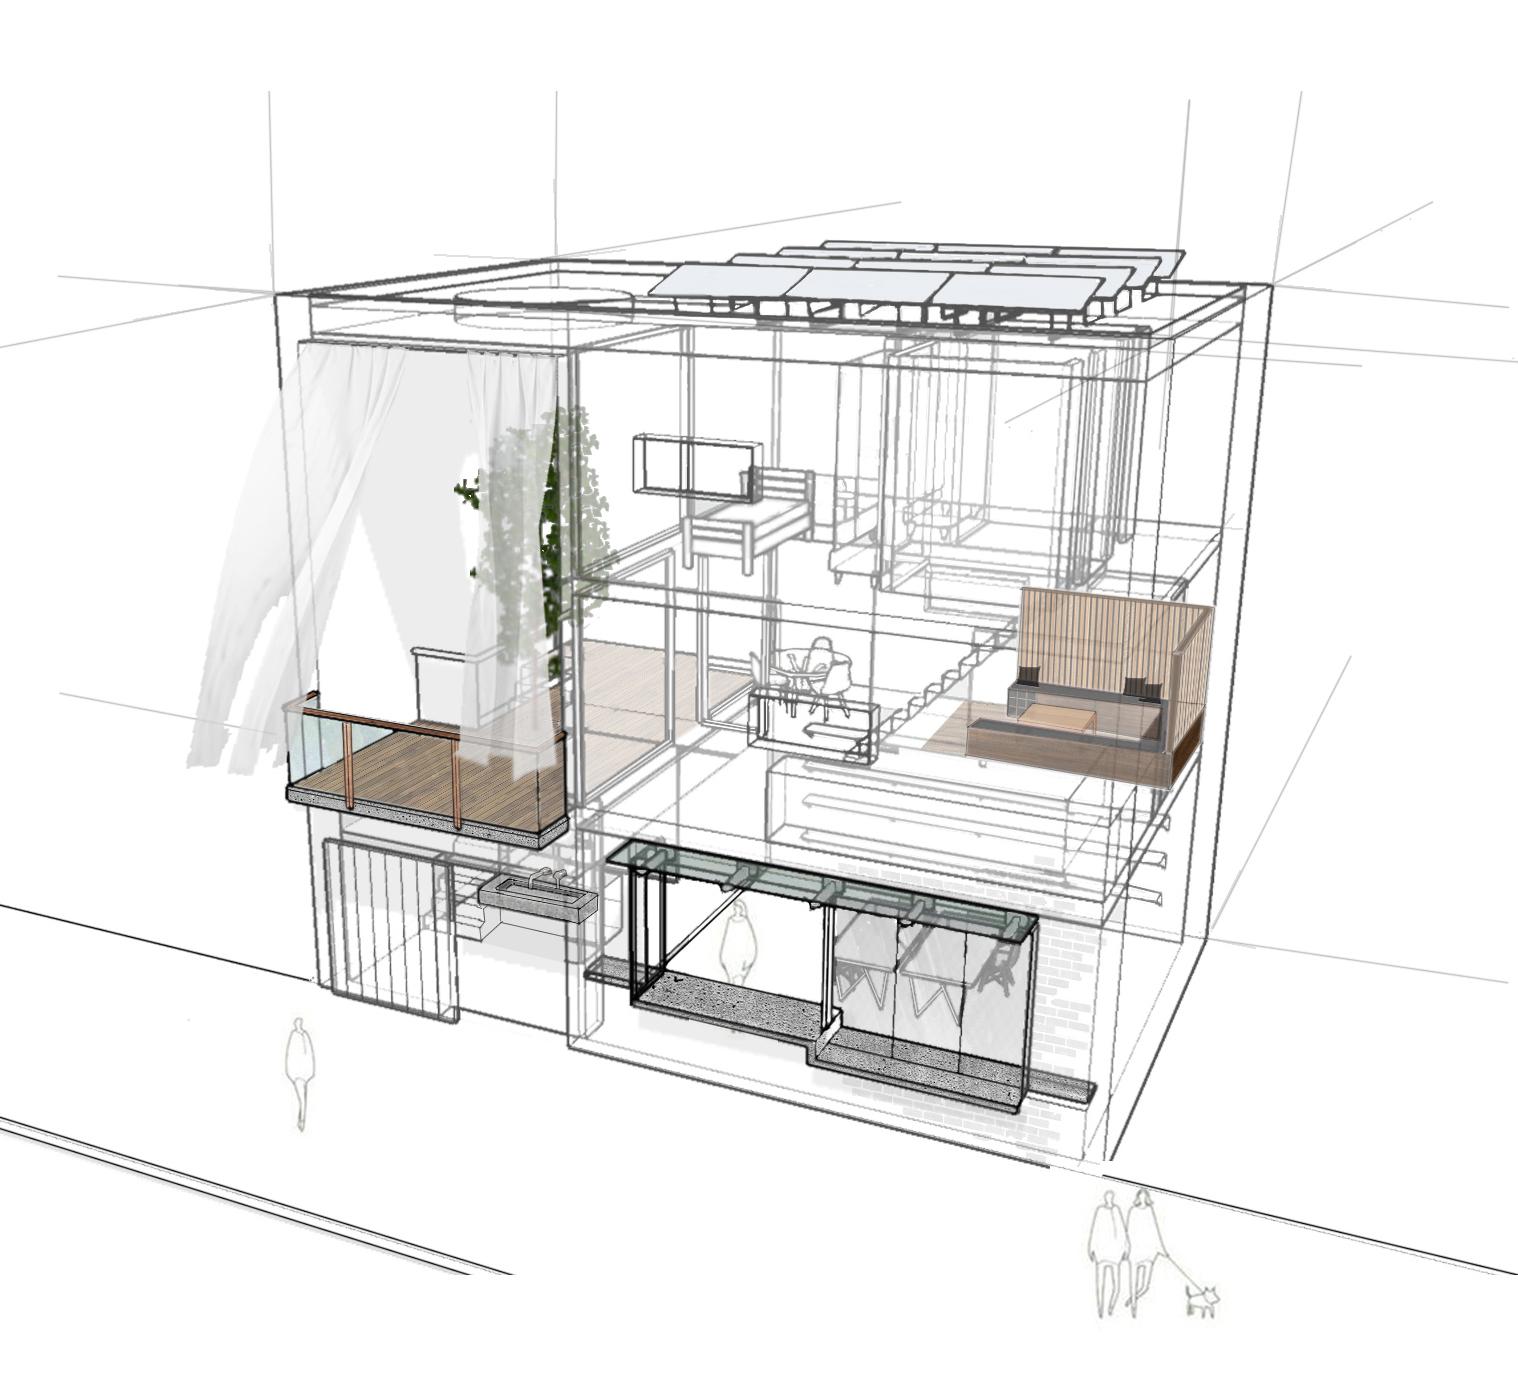 Haslam & Co Architects Make RIBA Journal Shortlist for Rethink 2025